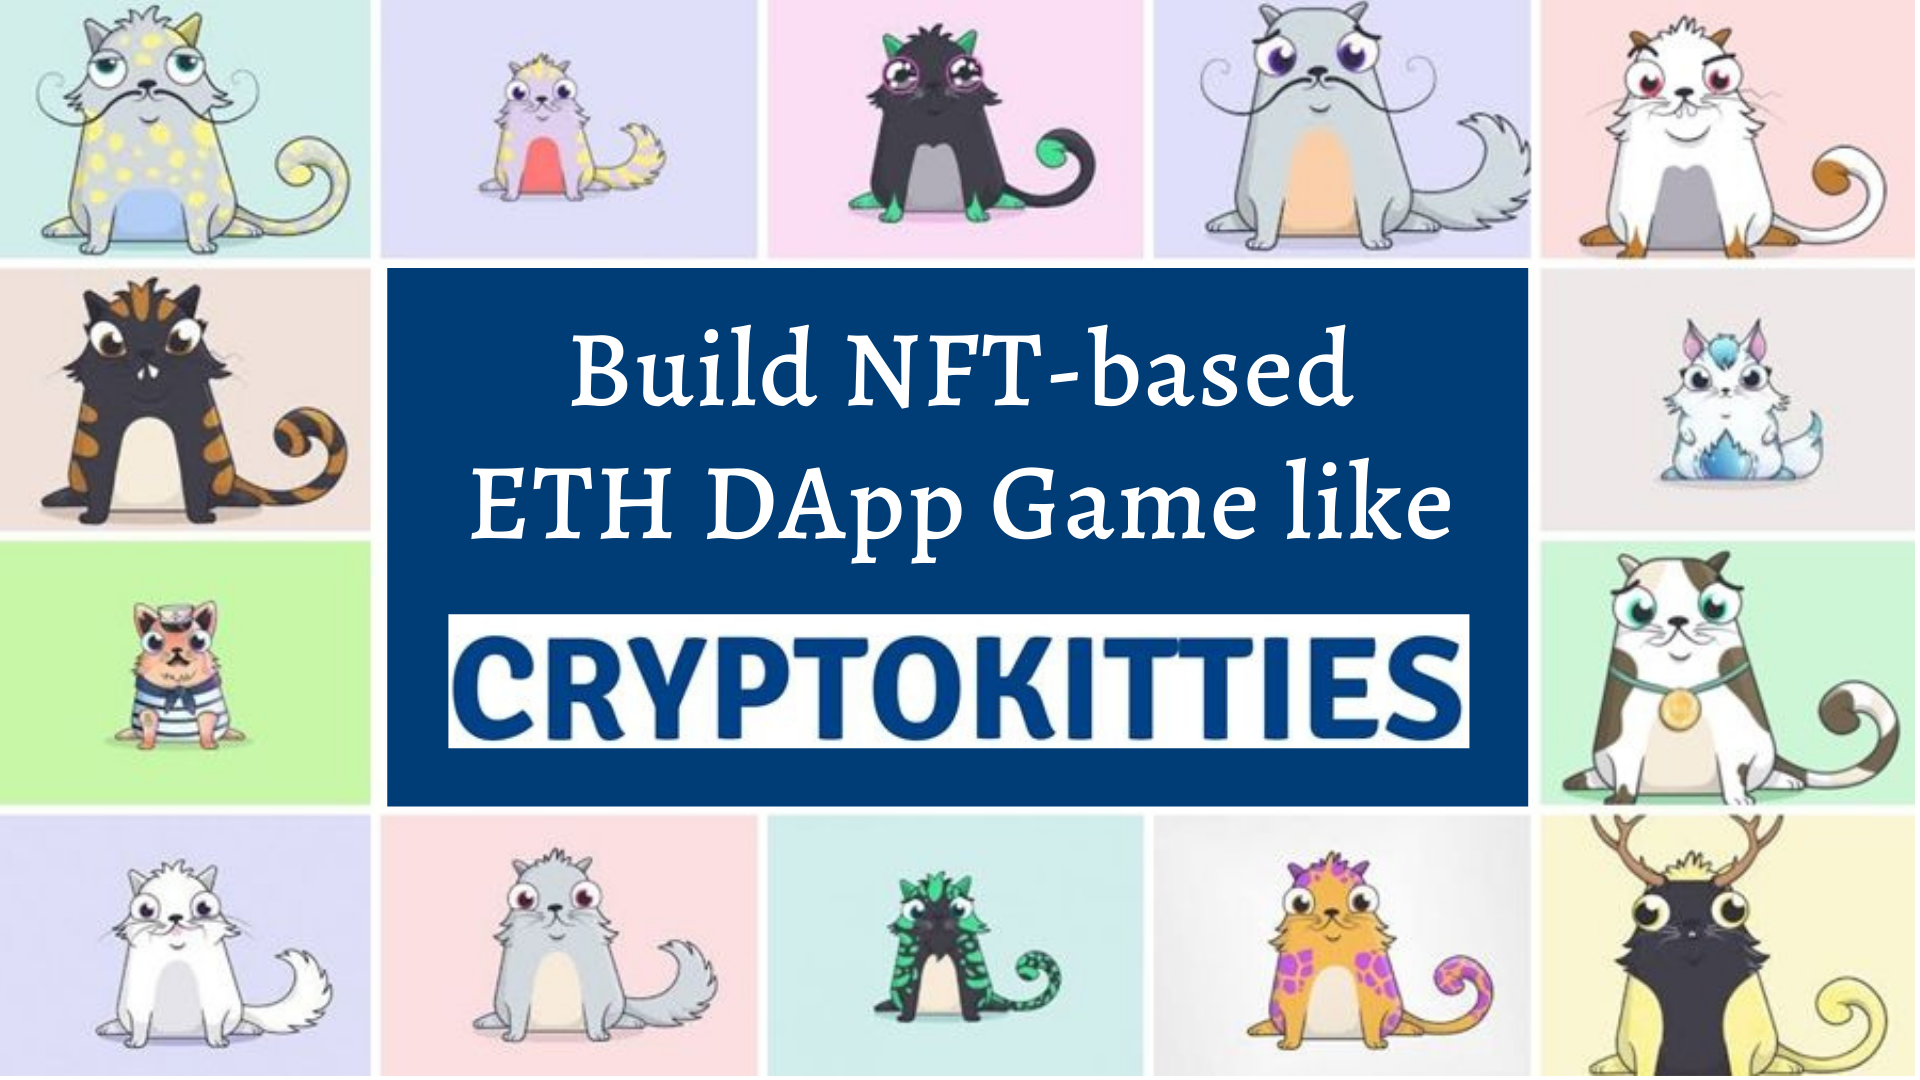 Cryptokitties Clone  - To Build Ethereum Blockchain Powered NFT Game like Cryptokitties